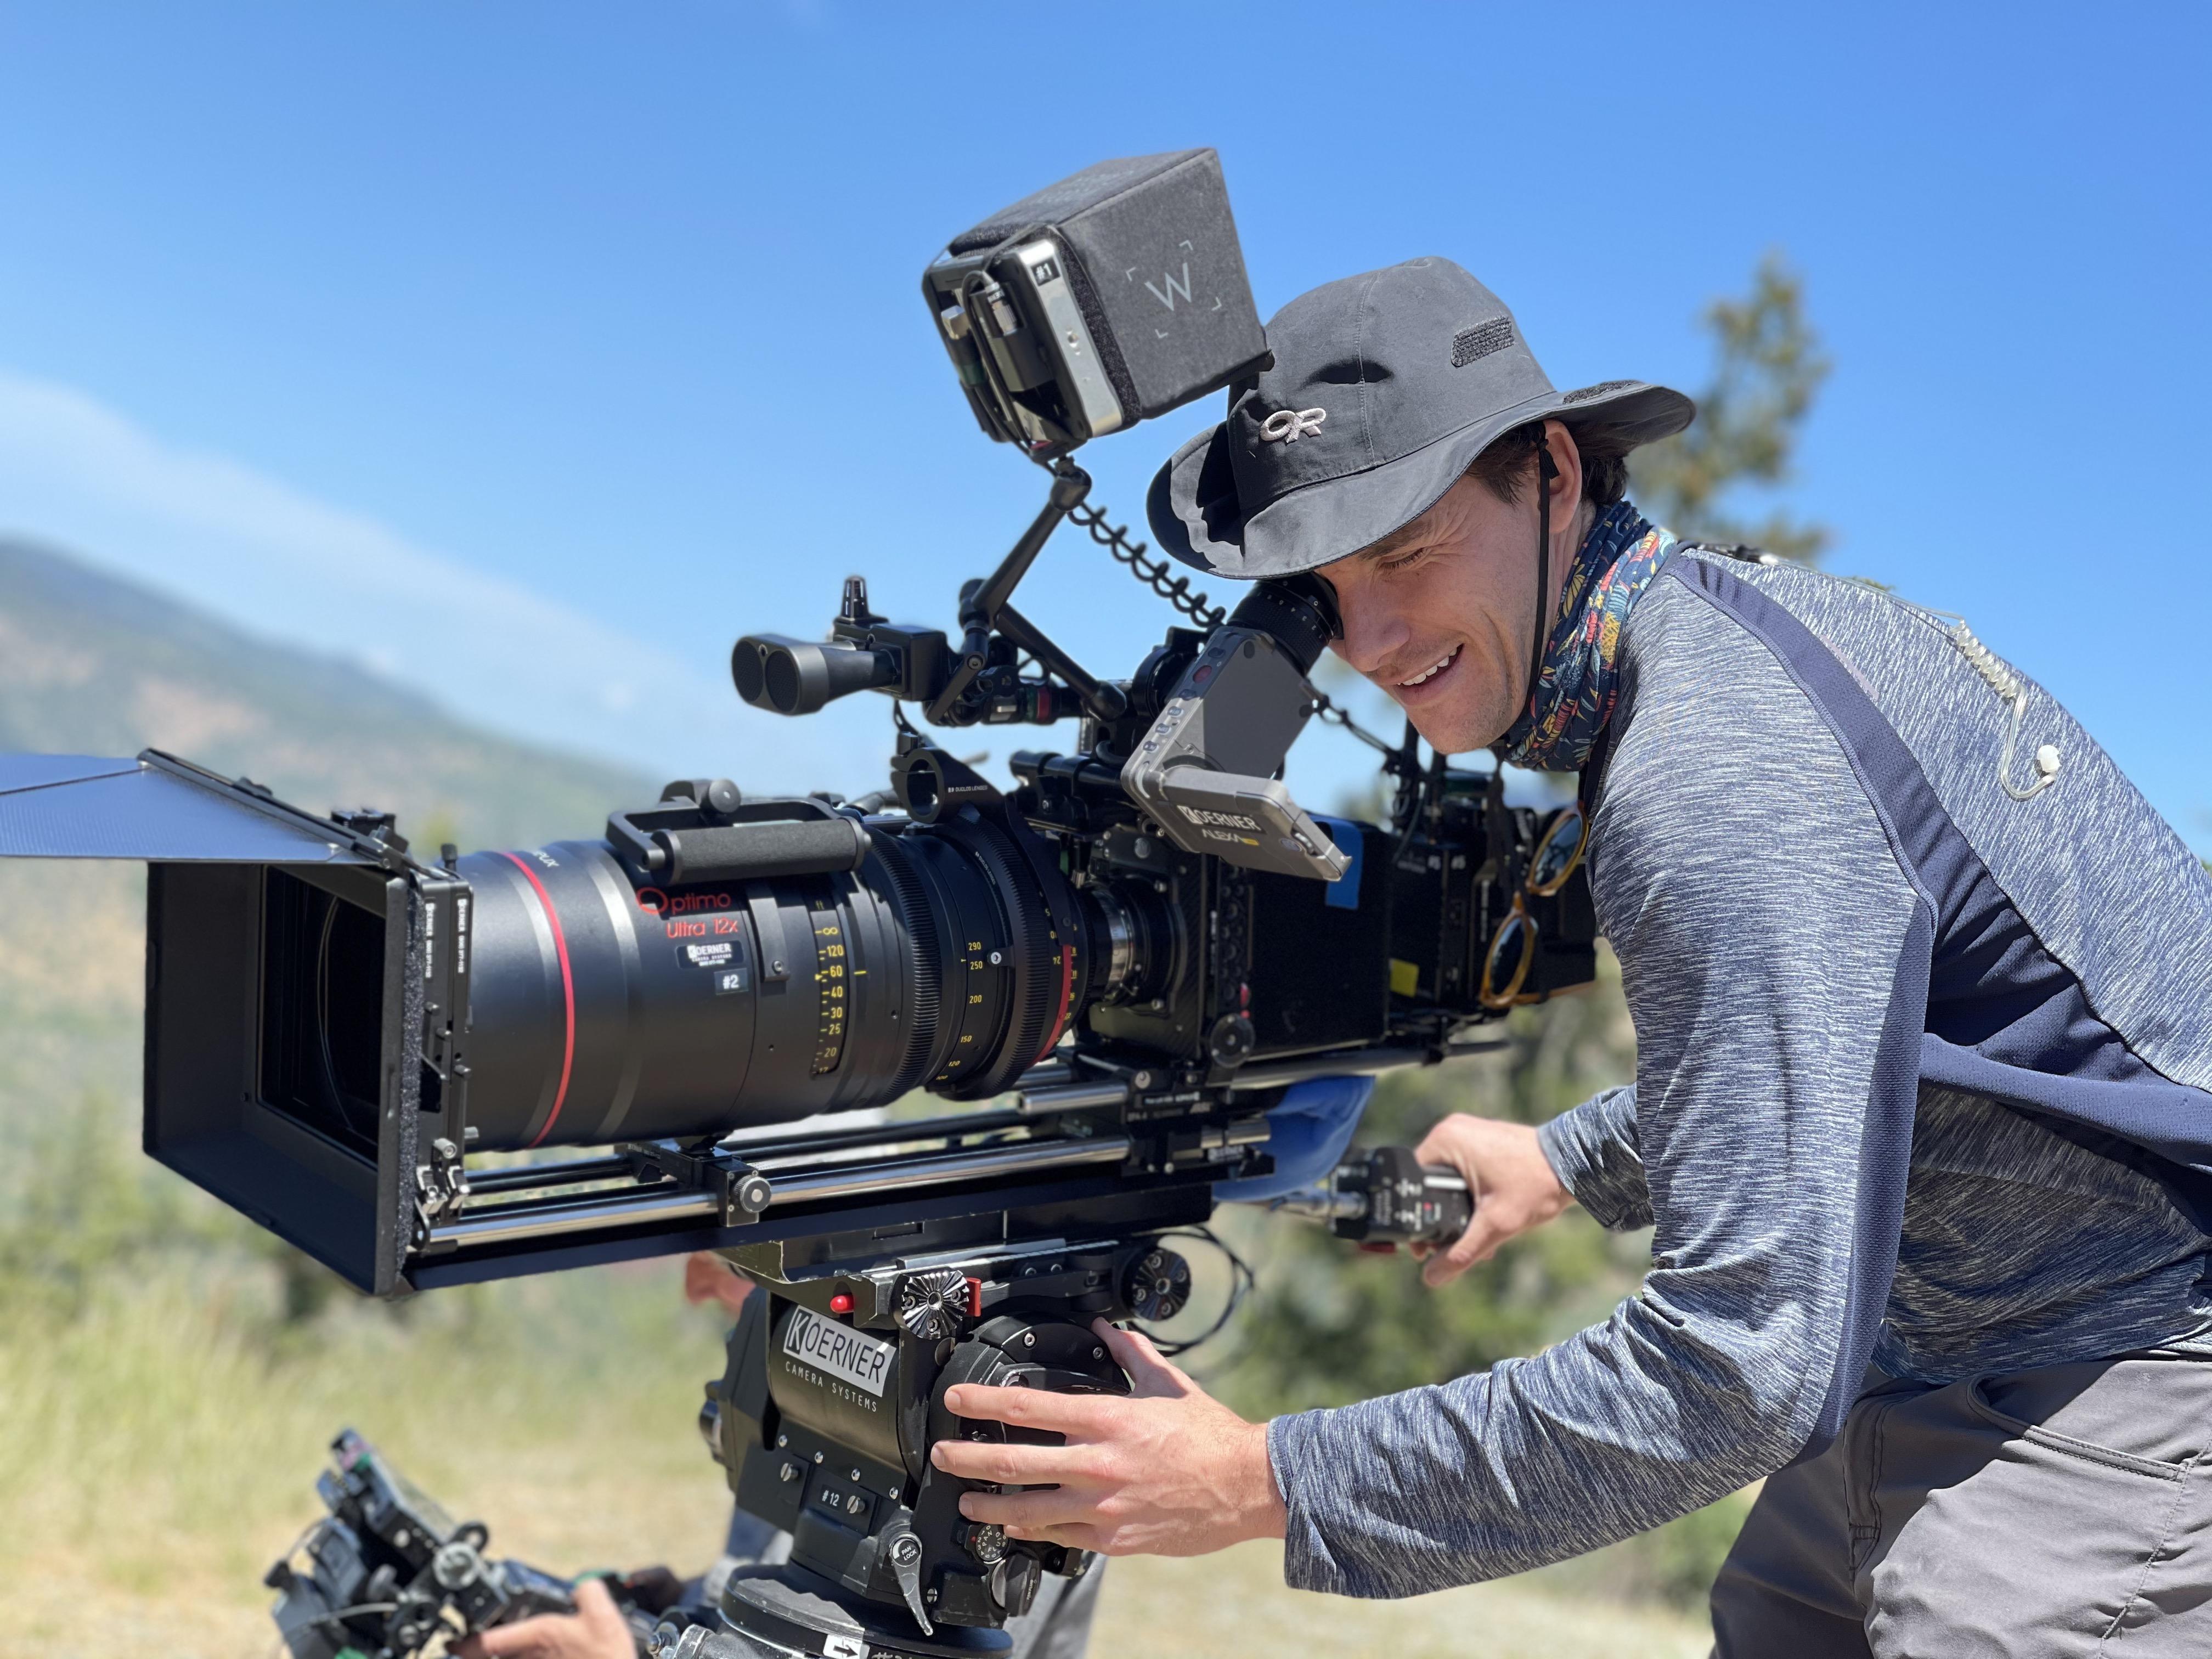 Cameraman David Markun